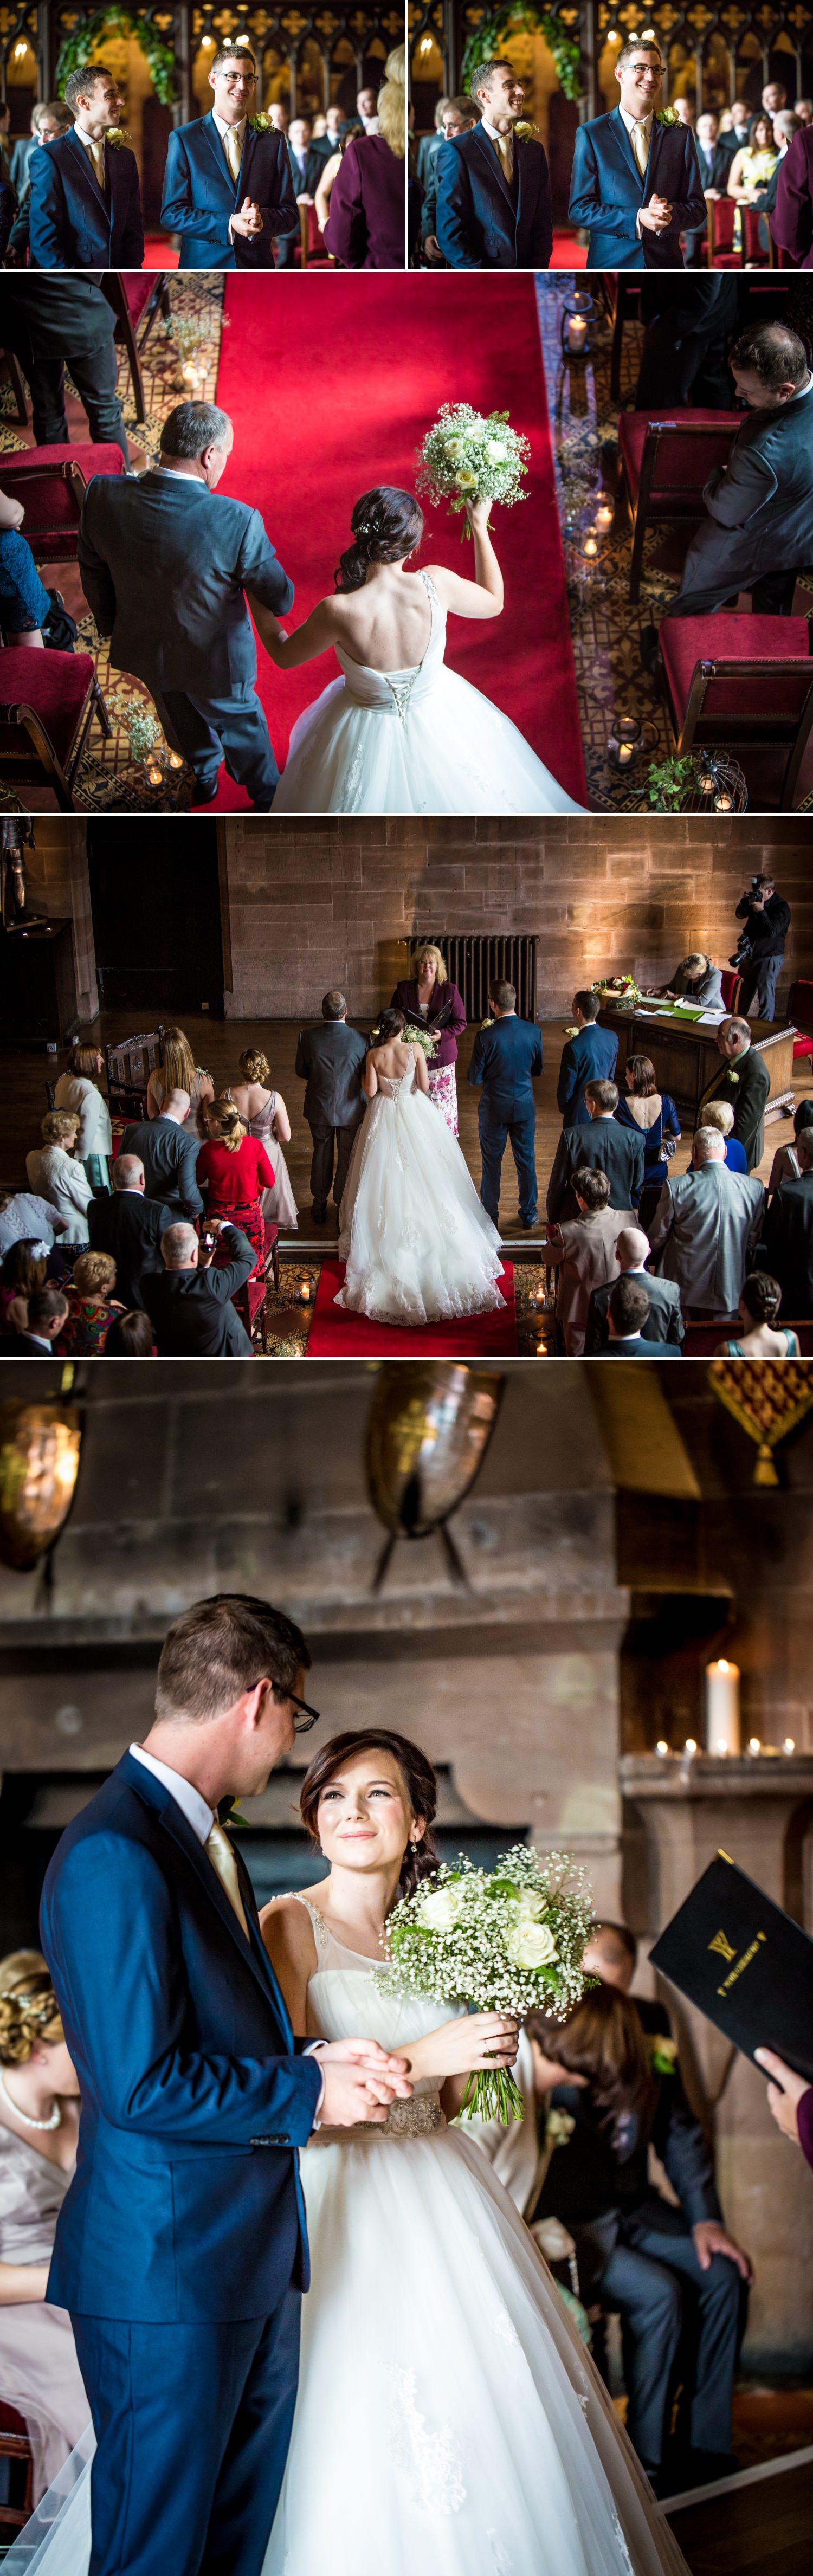 wedding ceremony photographs at Peckforton Castle, chester